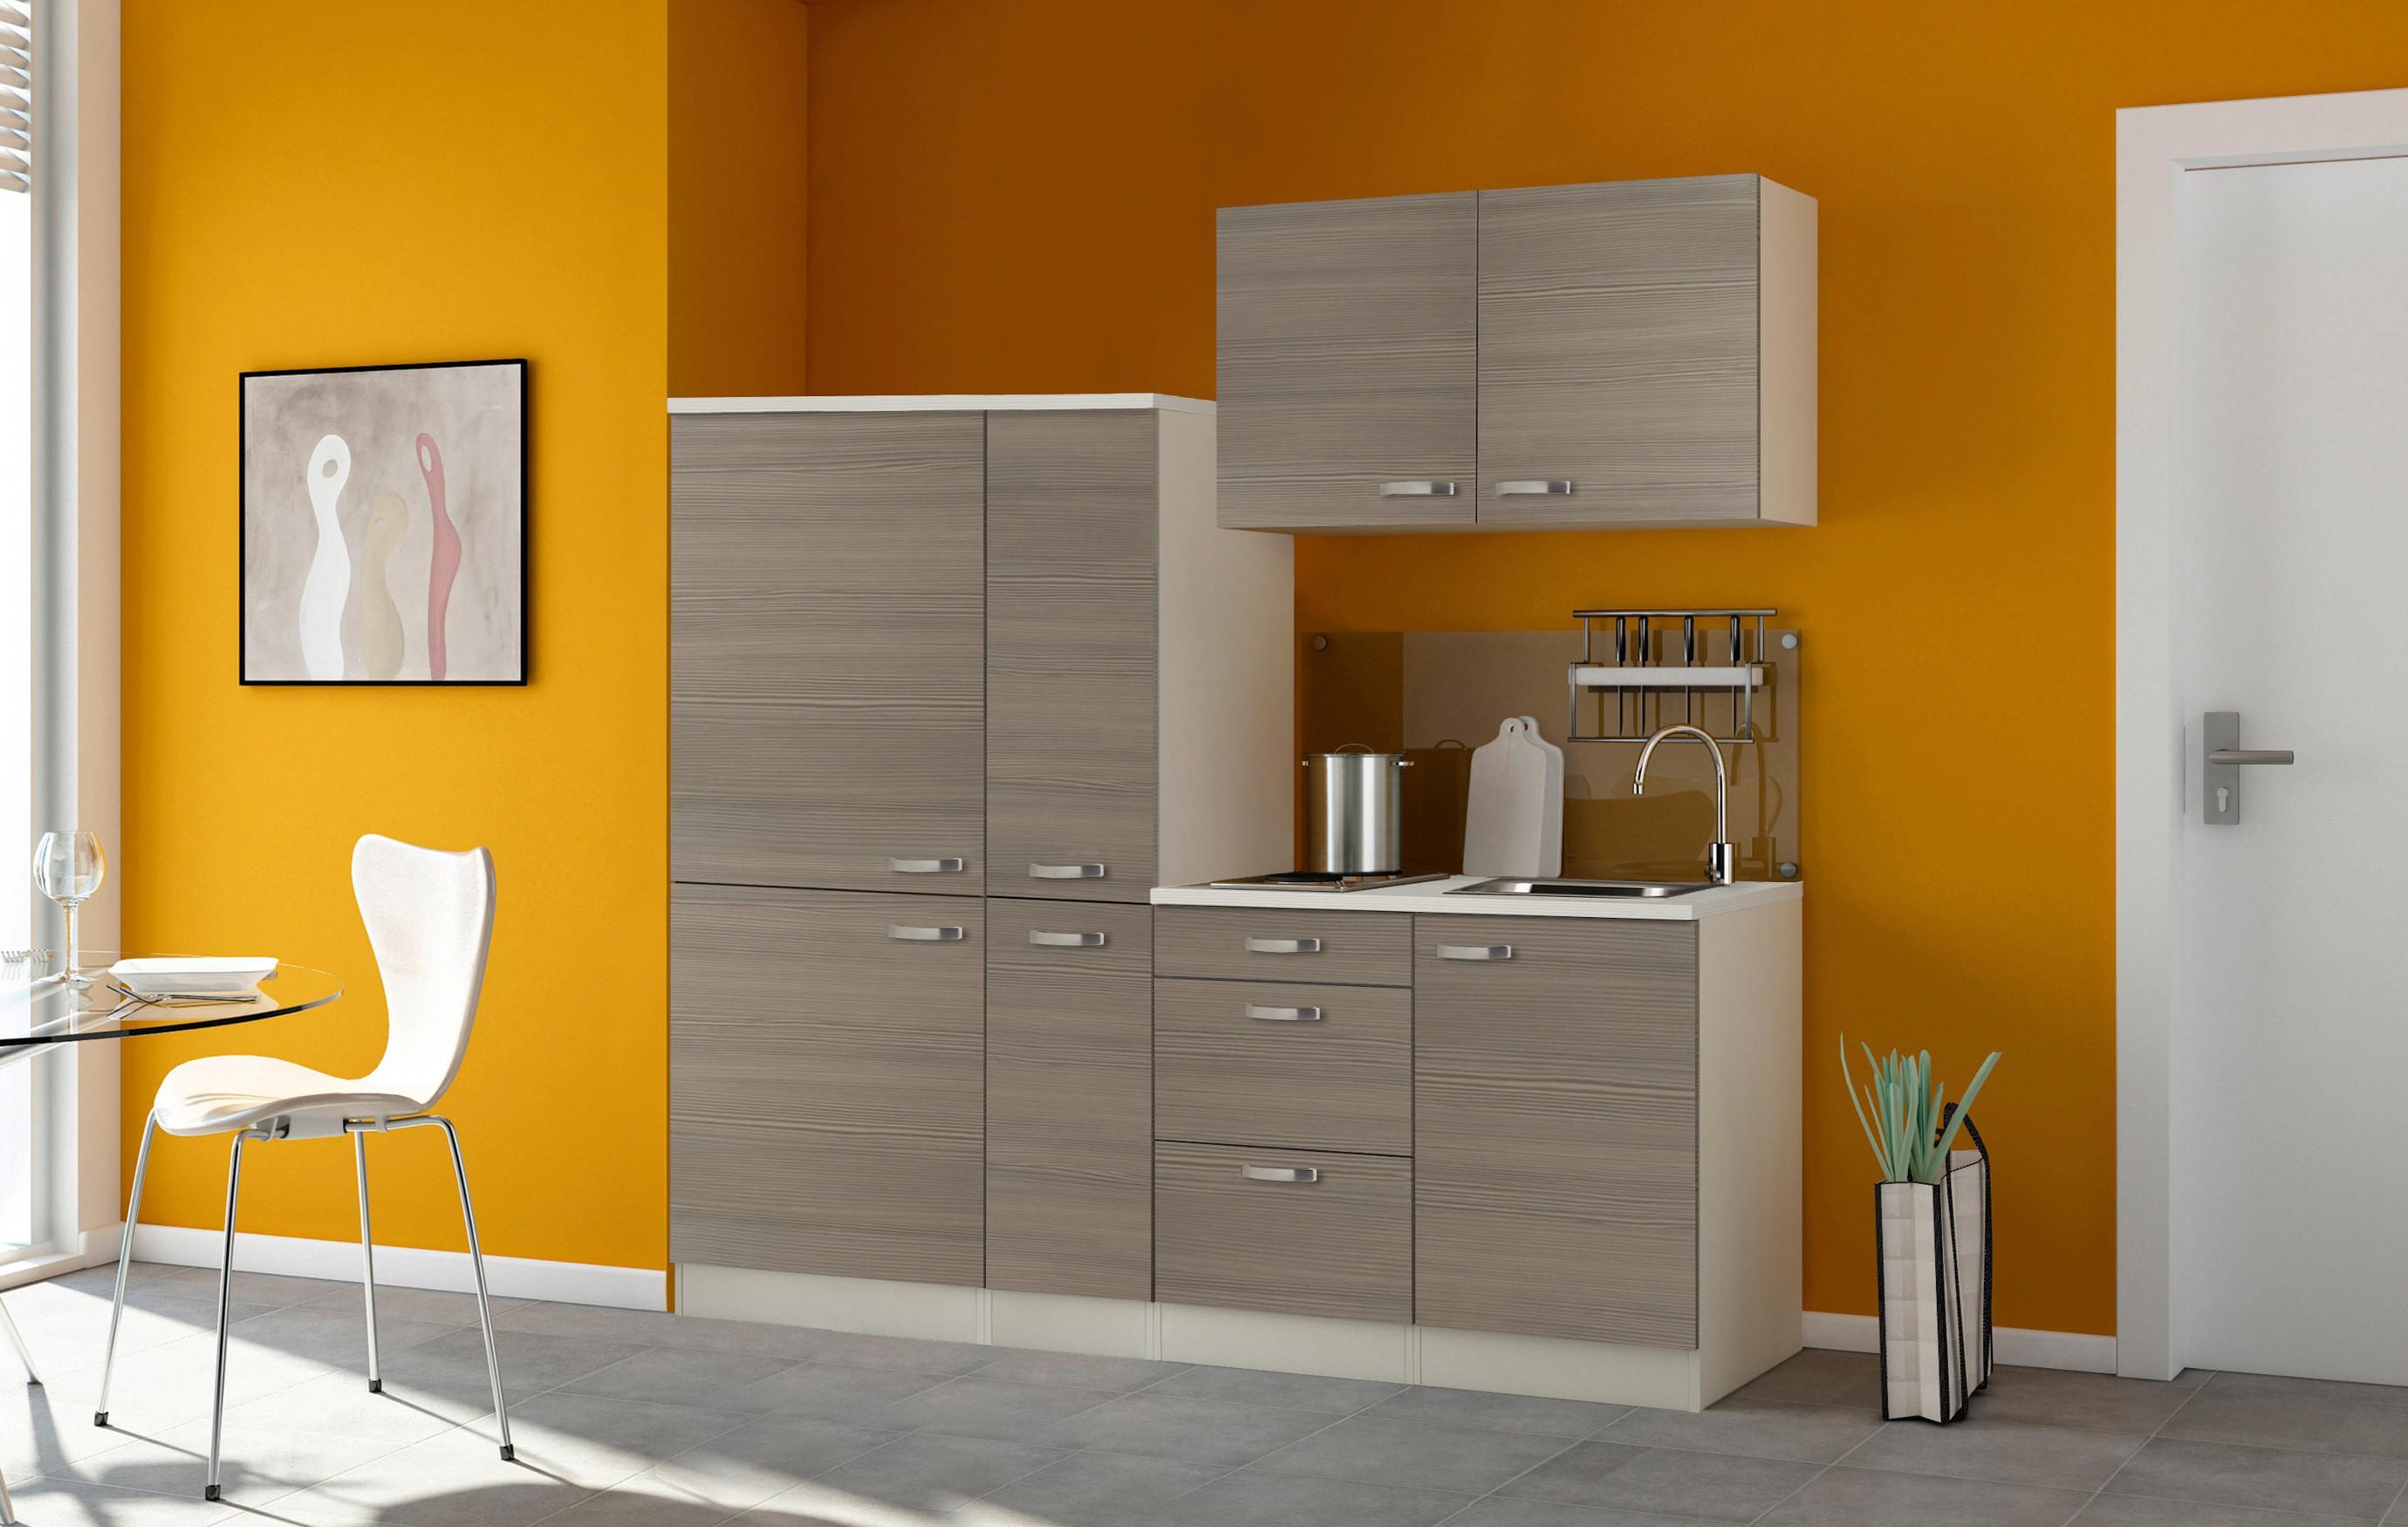 singlek che toledo mit elektro kochfeld breite 190 cm pinie nougat k che singlek chen. Black Bedroom Furniture Sets. Home Design Ideas